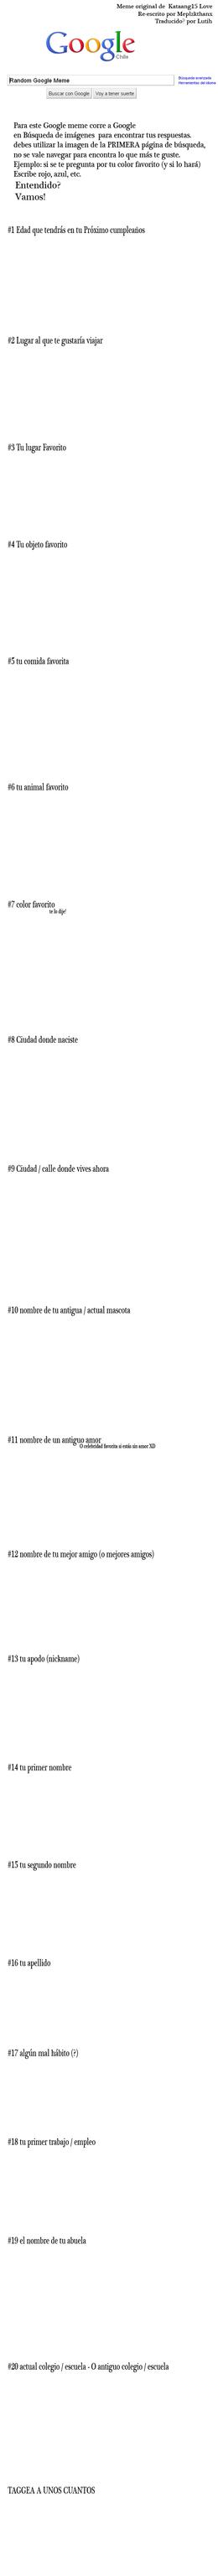 Google Meme - spanish by Lutih